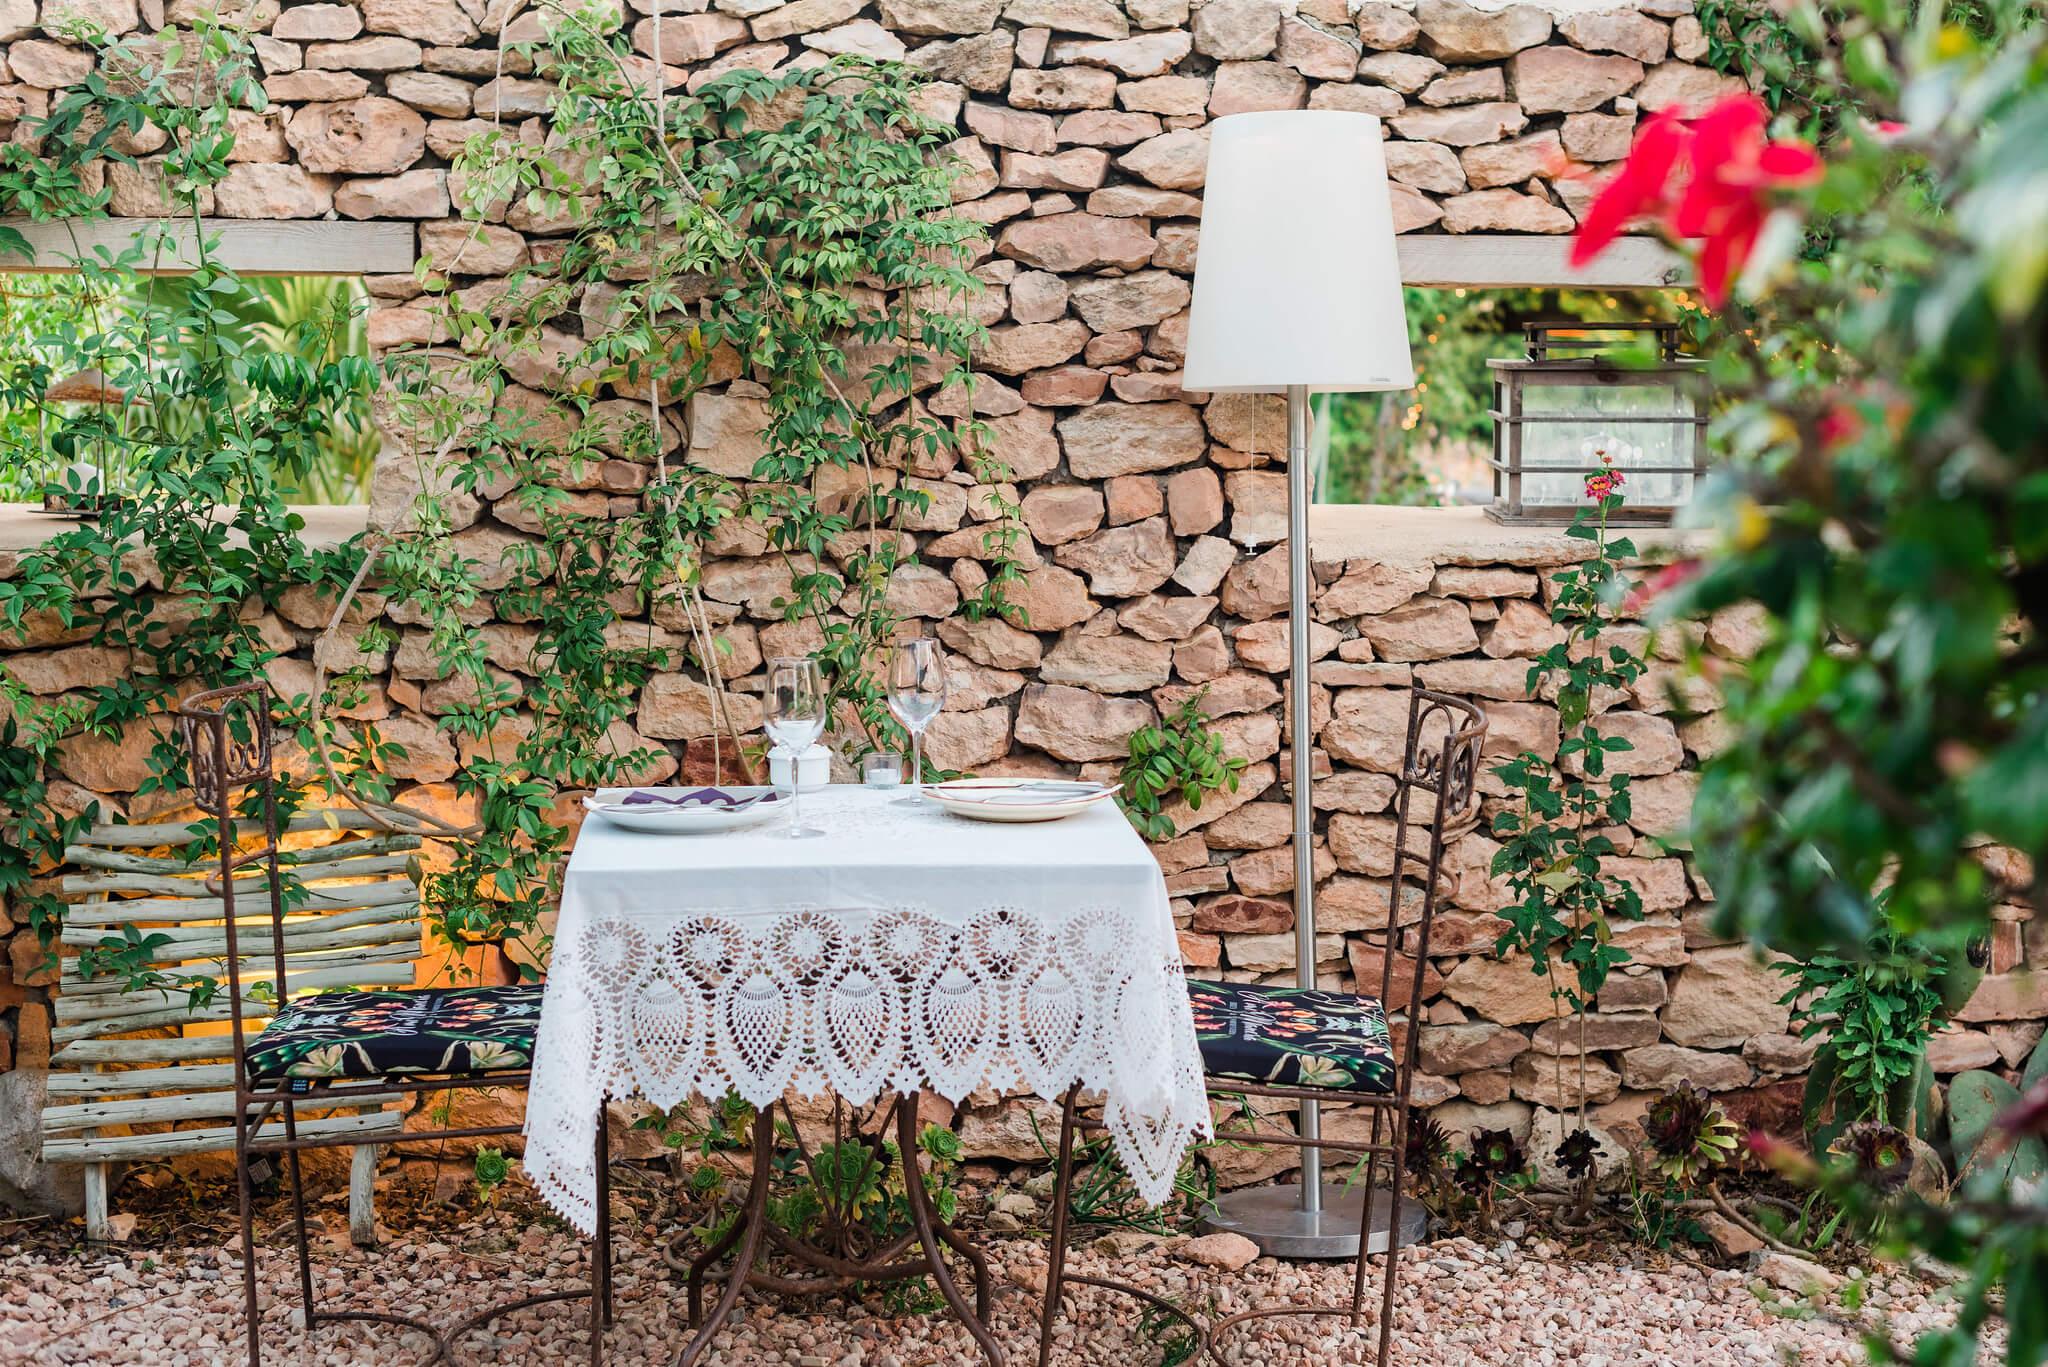 https://www.white-ibiza.com/wp-content/uploads/2020/03/formentera-restaurants-a-mi-manera-2020-10.jpg